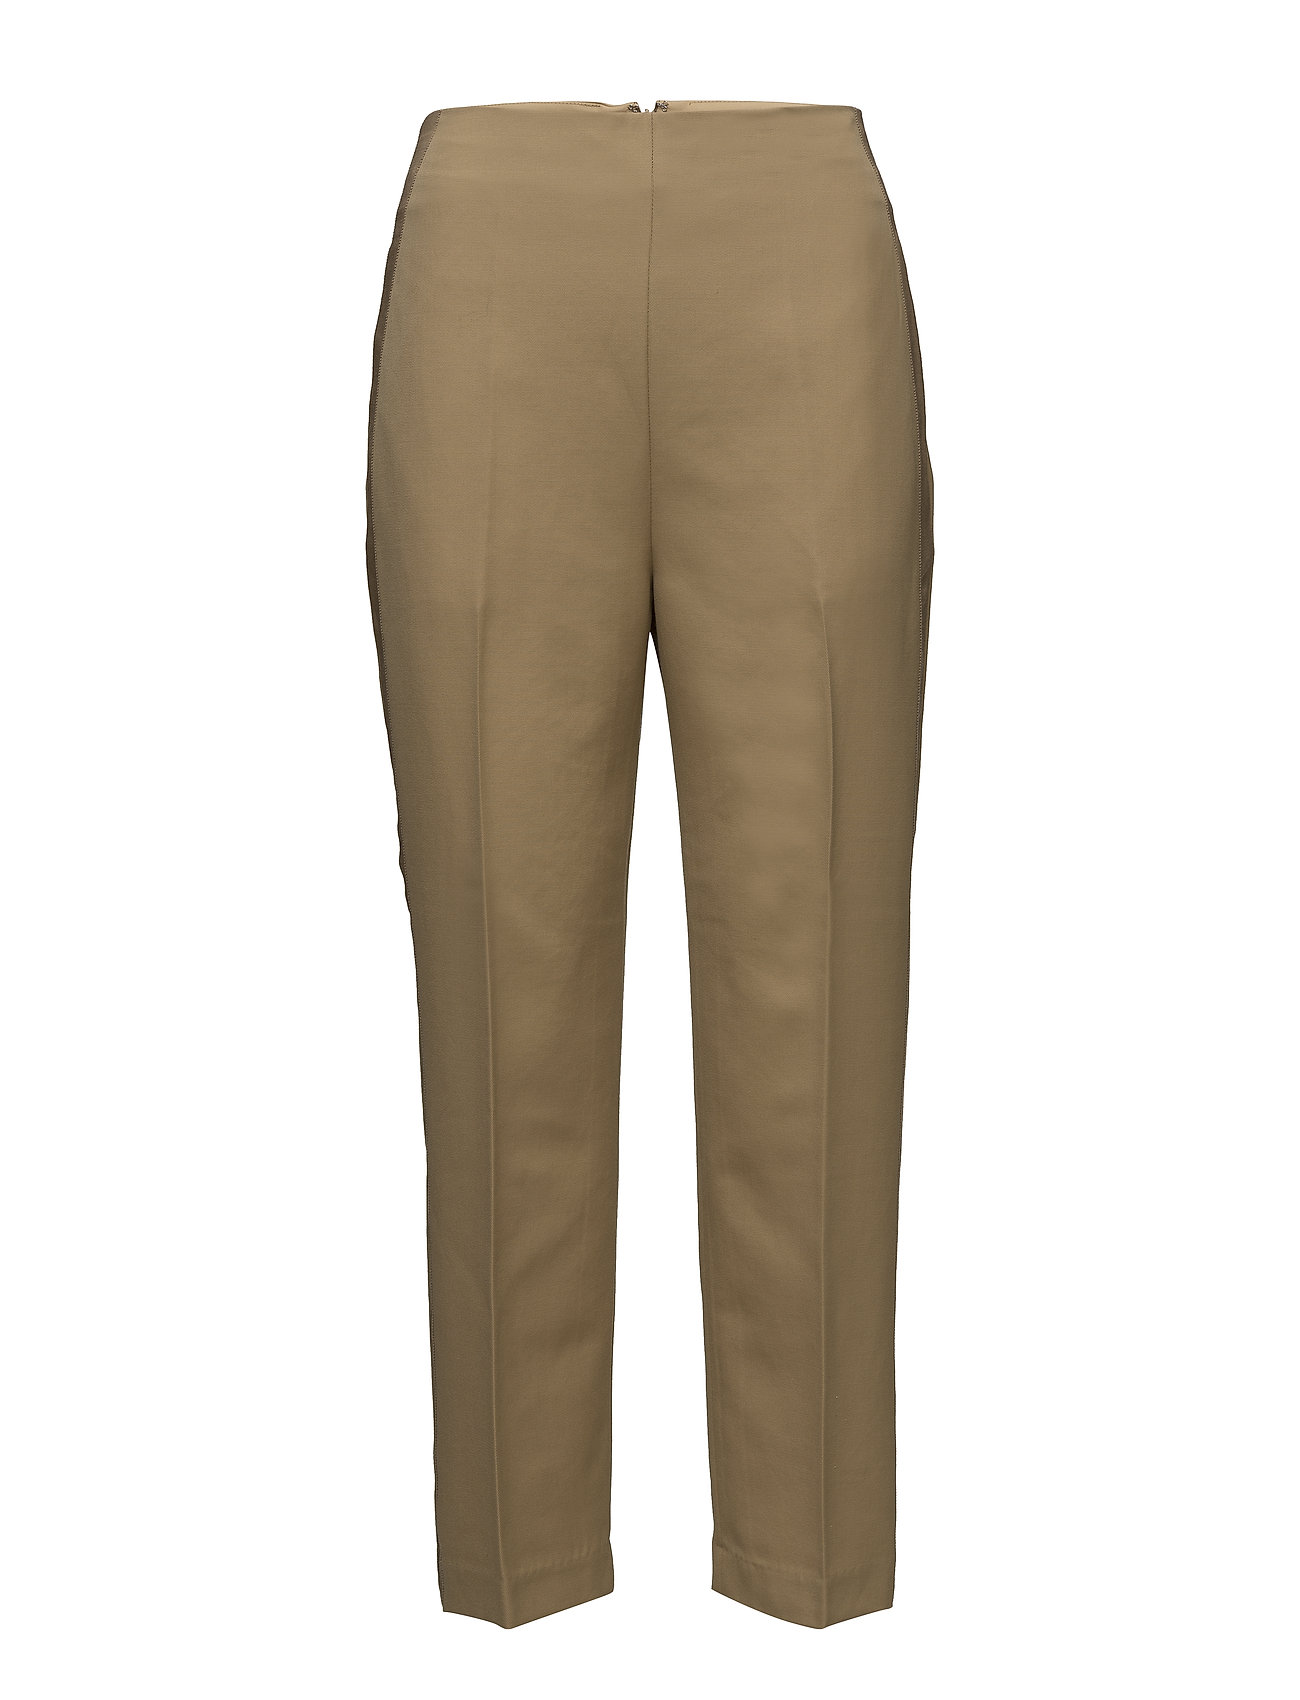 Image of Tailored Pant W Grosgrain Trim Bukser Med Lige Ben Brun 3.1 PHILLIP LIM (3055981327)